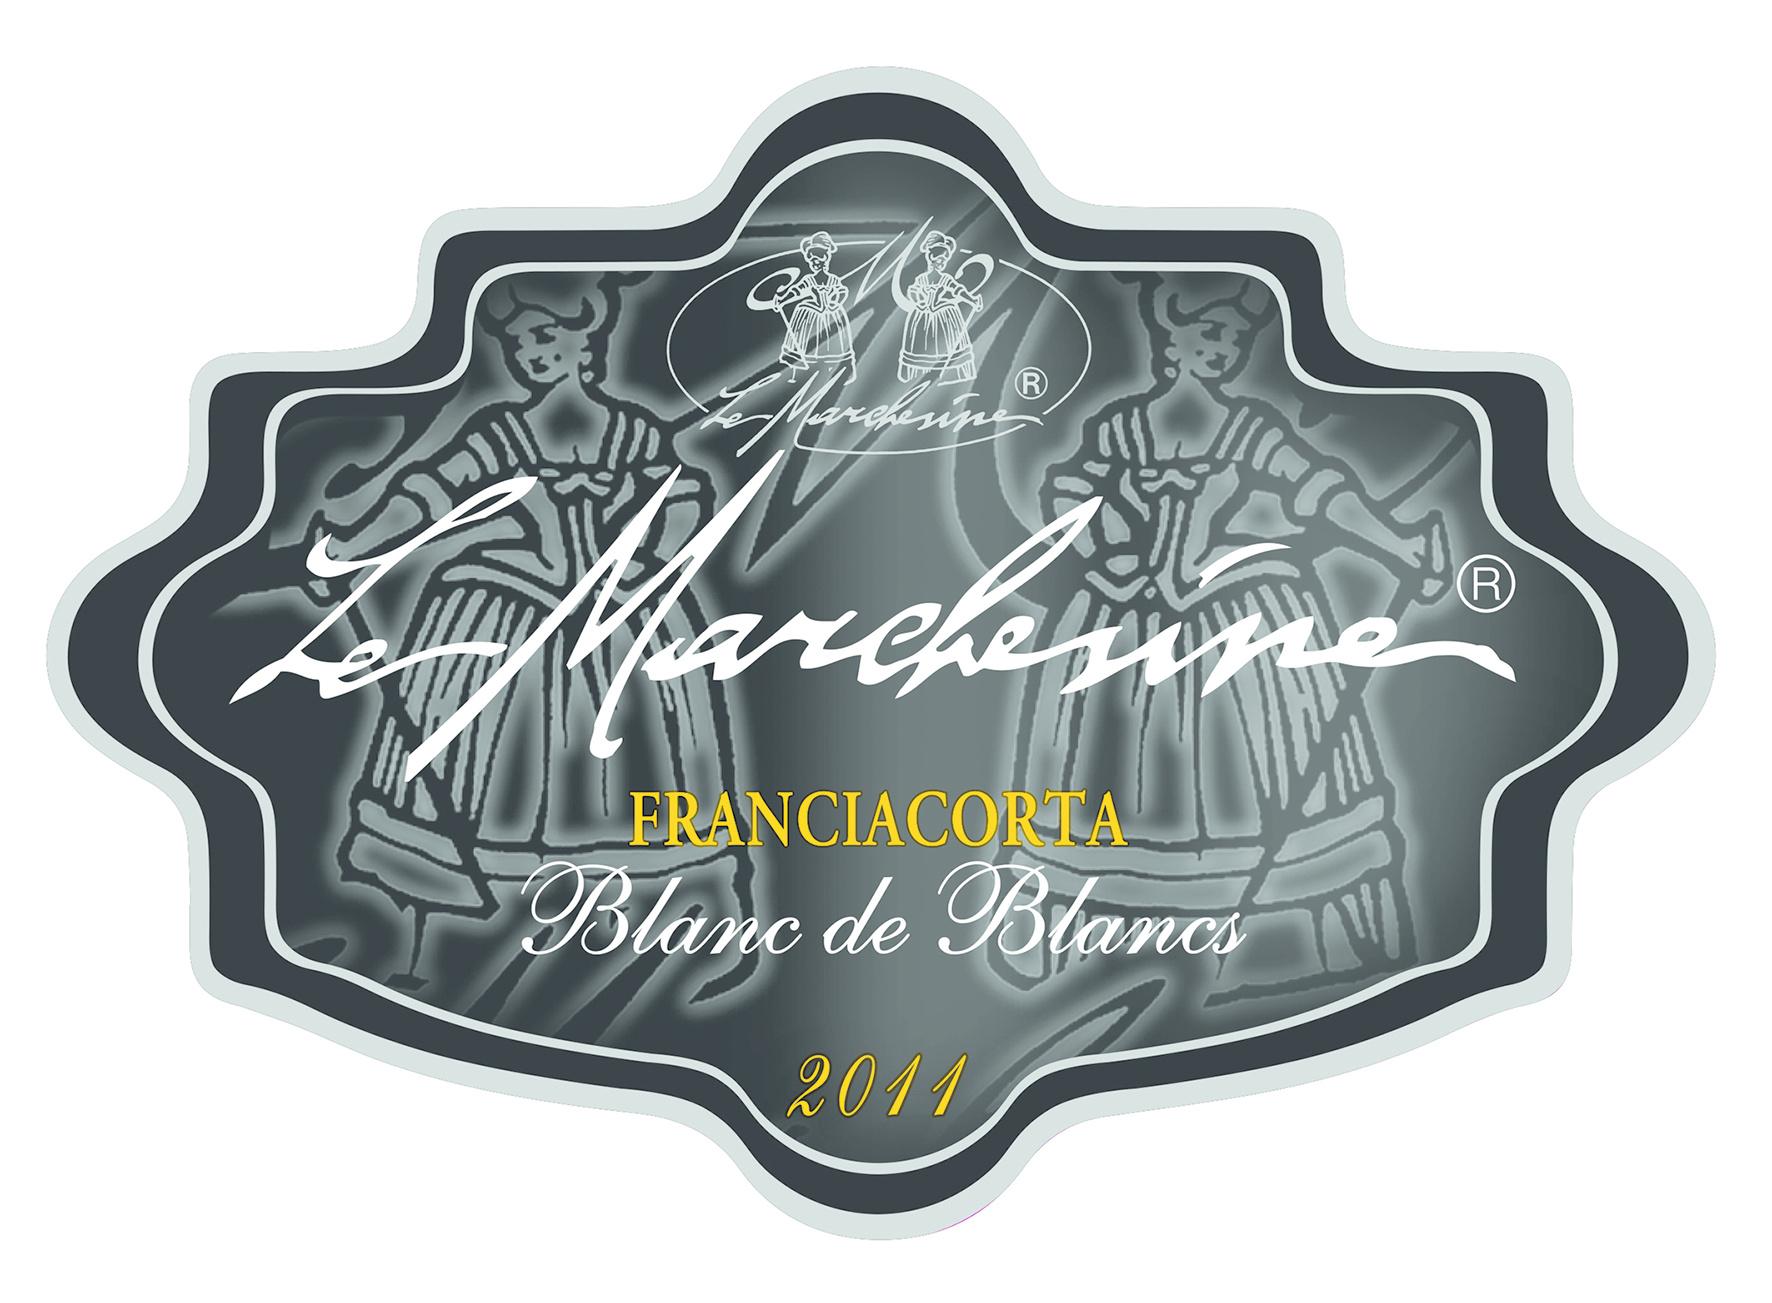 Le Marchesine, Franciacorta Blanc de blanc, 2012